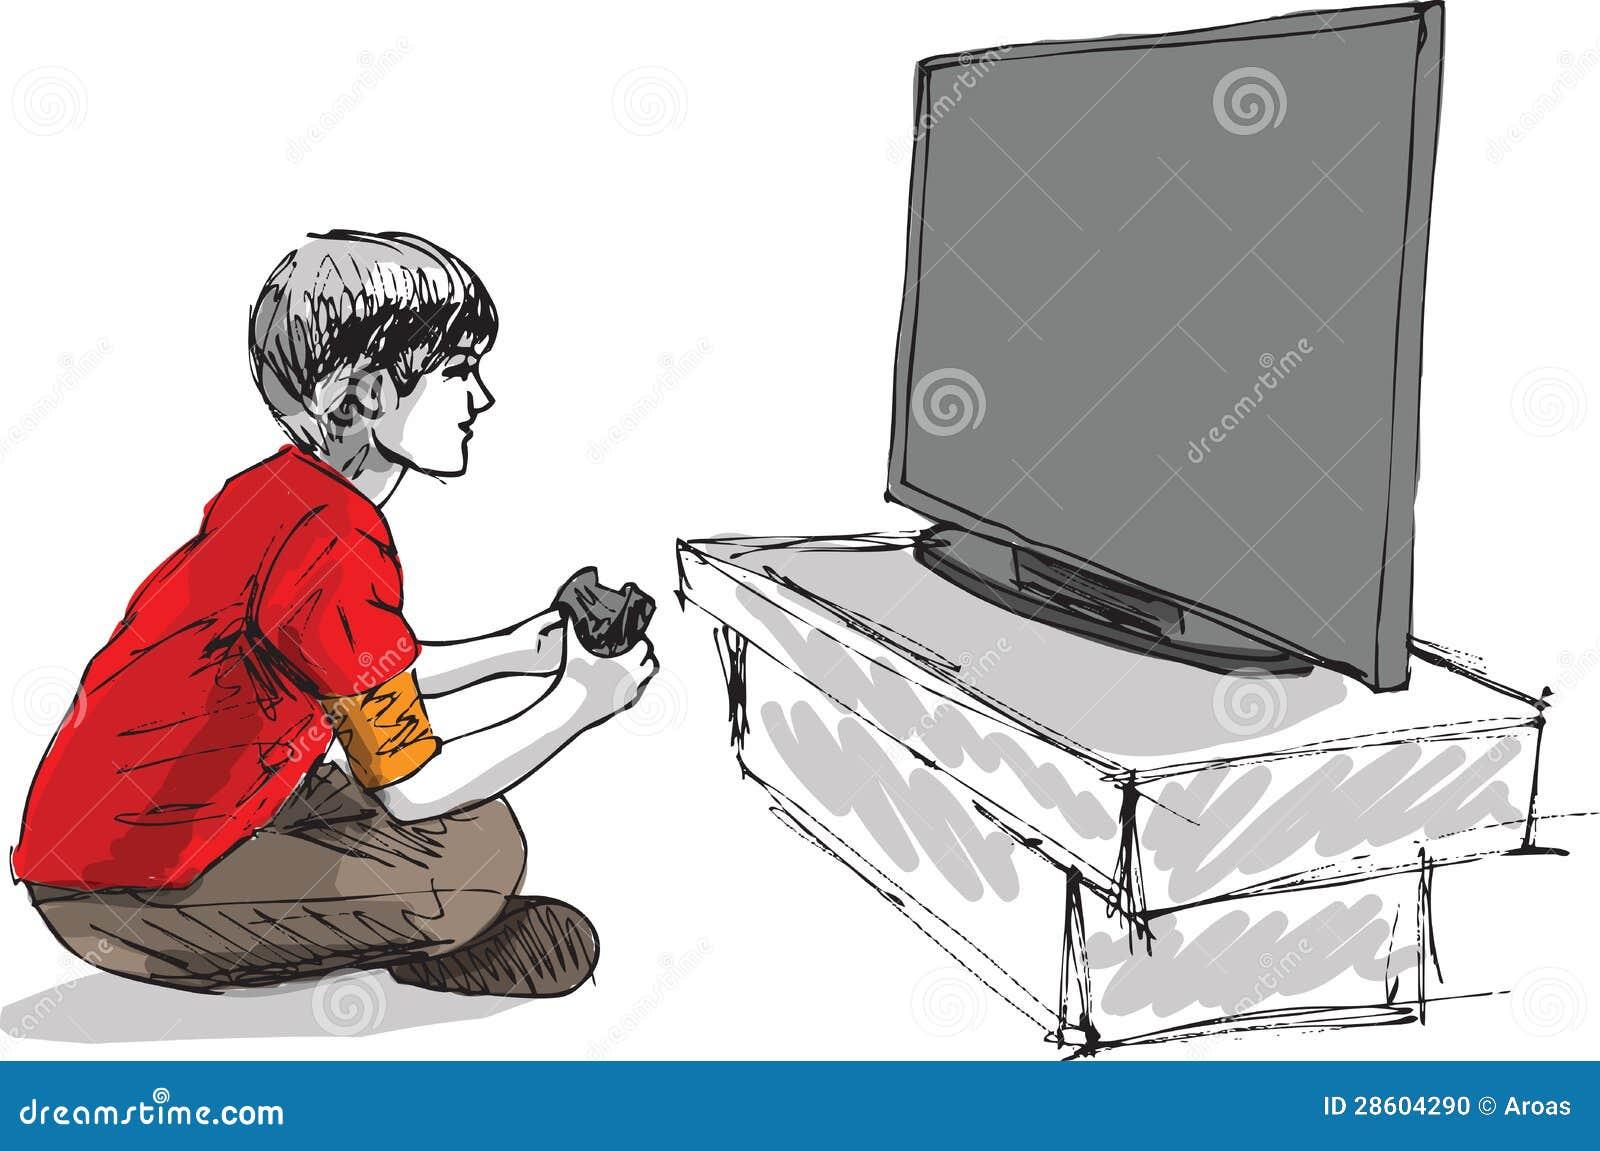 Boy playing computer game made in adobe illustrator